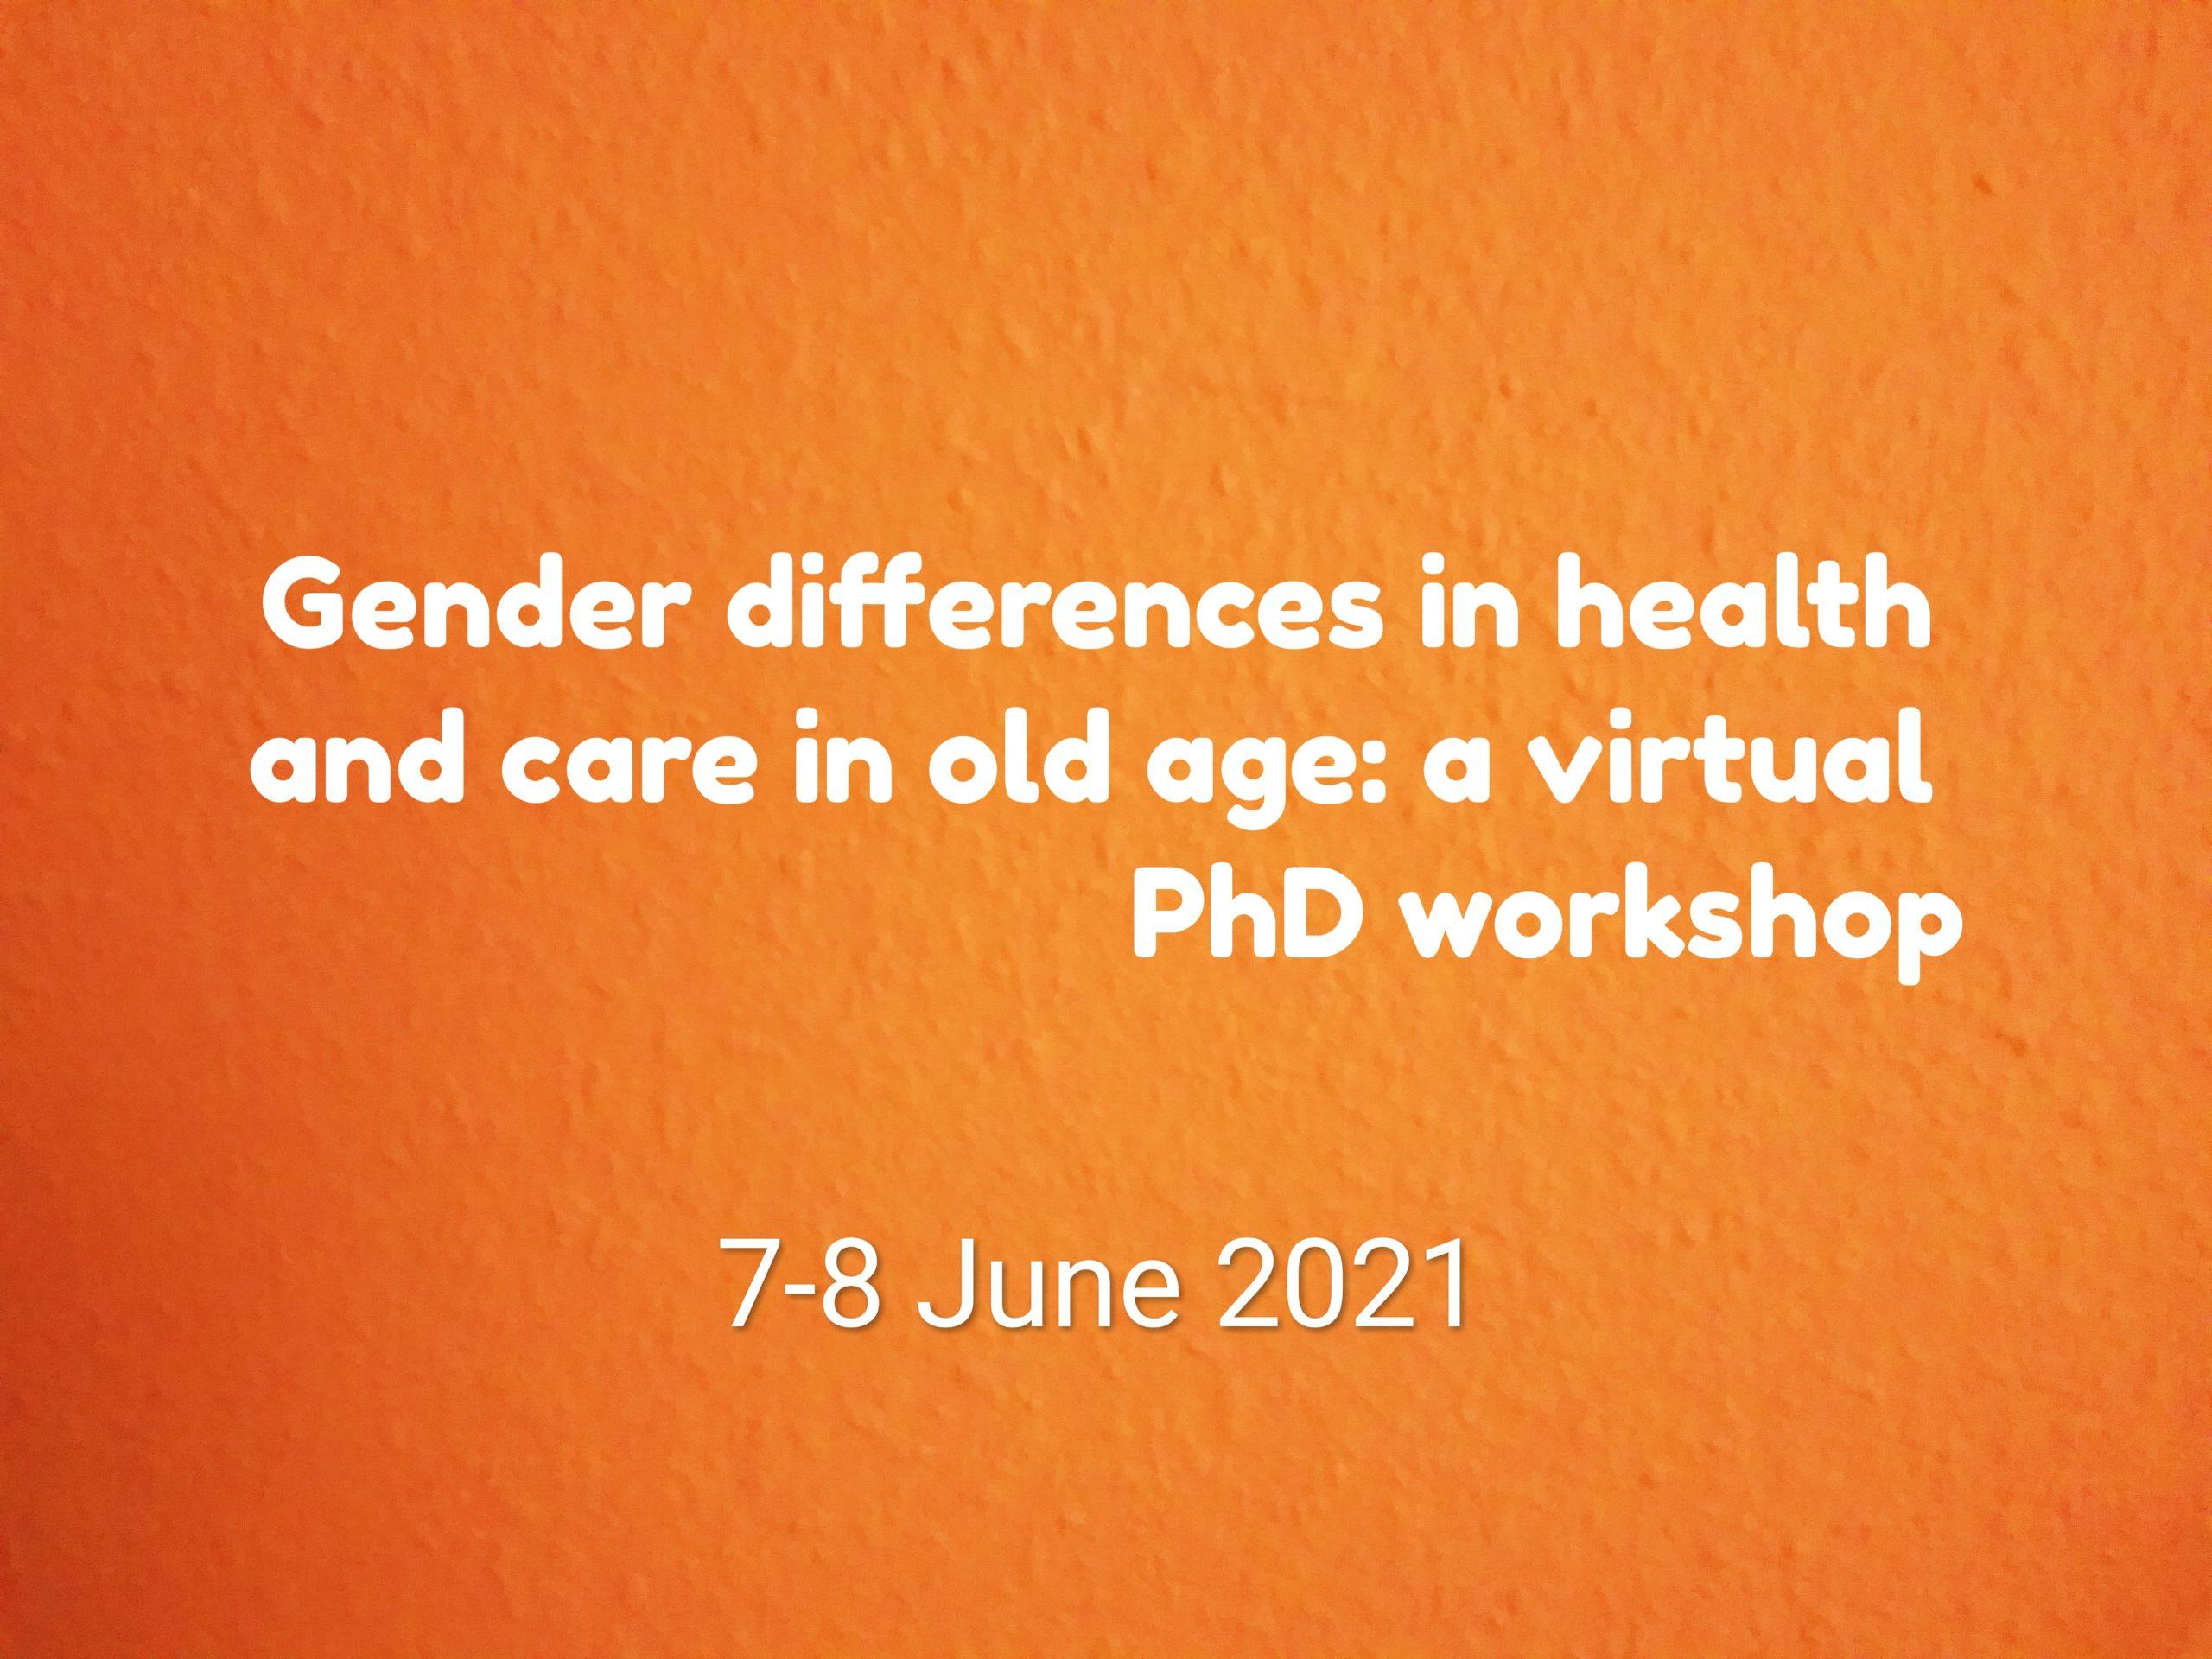 Call for participants – FutureGEN PhD Workshop 7-8 June 2021